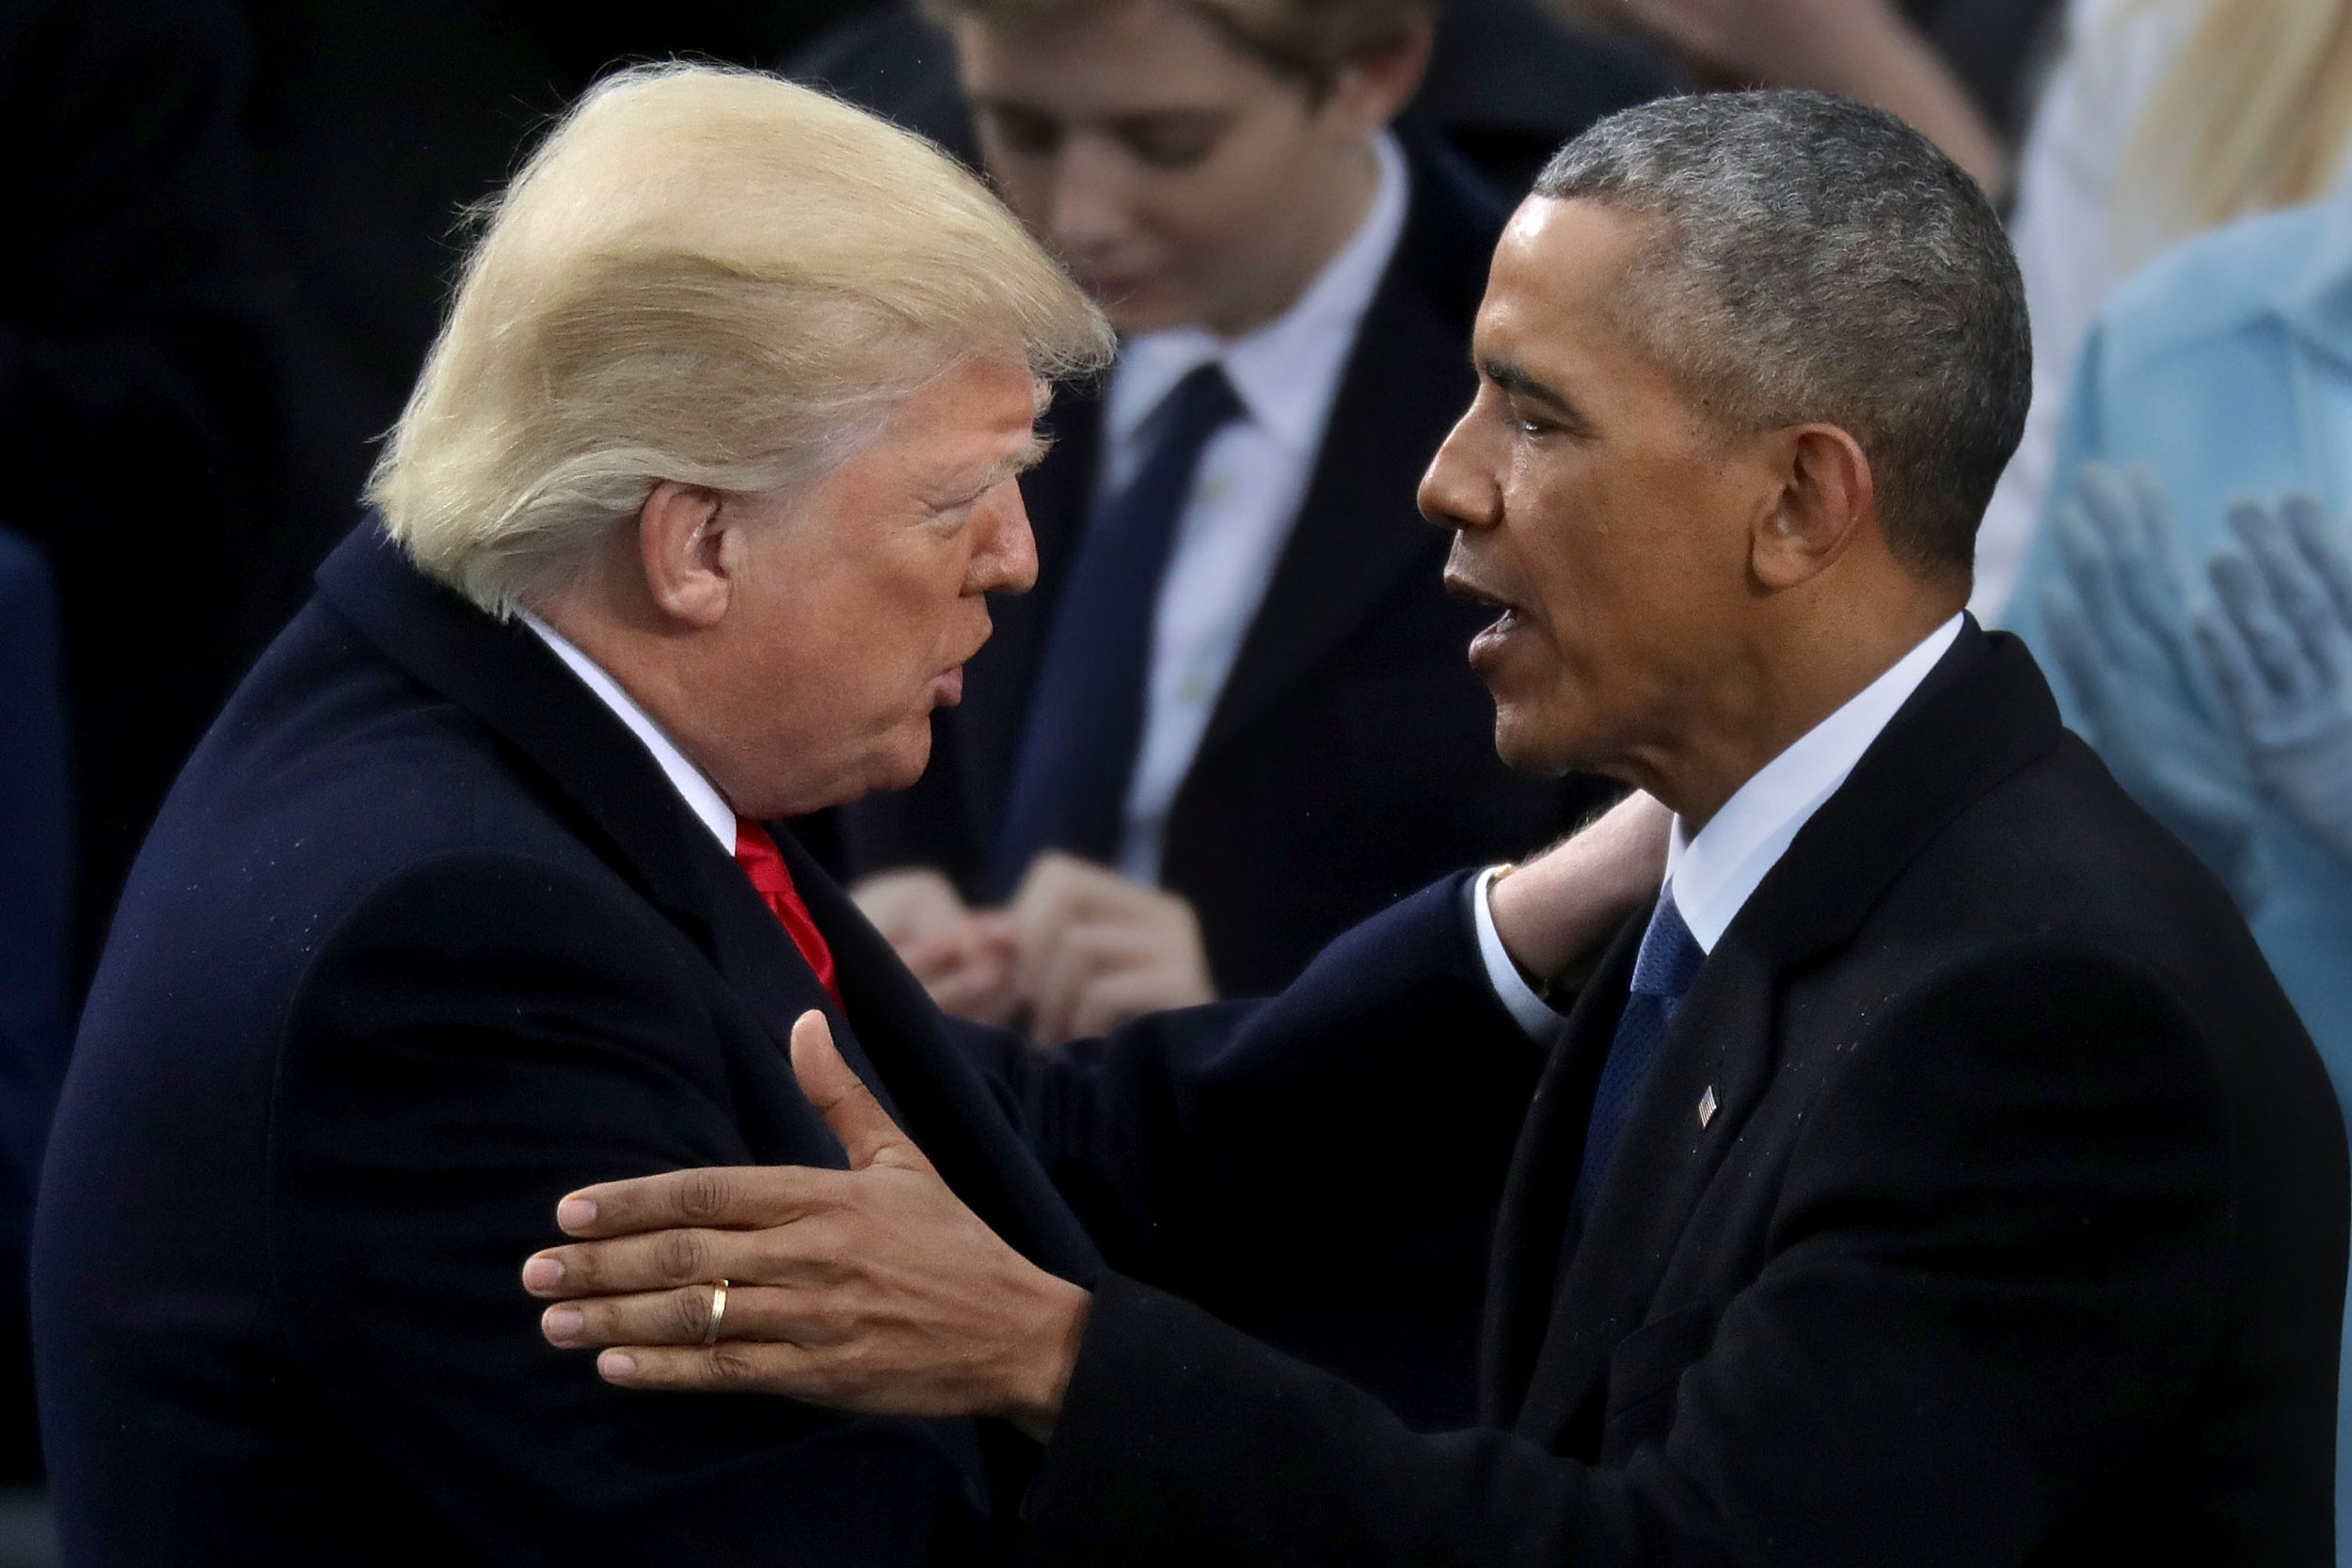 Obama and Trump inauguration